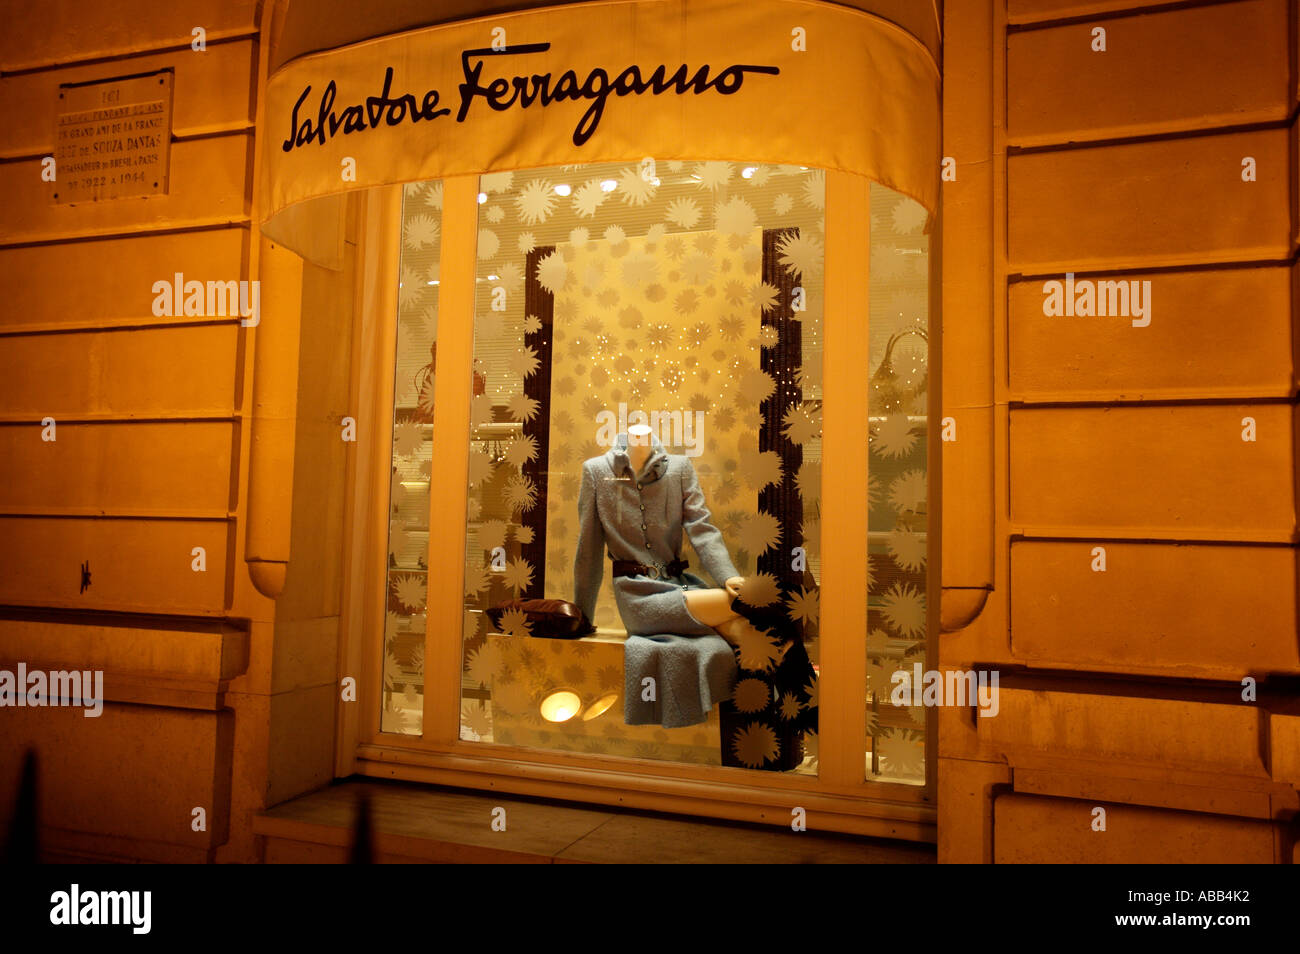 Paris, Salvatore Ferragamo Shop Front - Stock Image